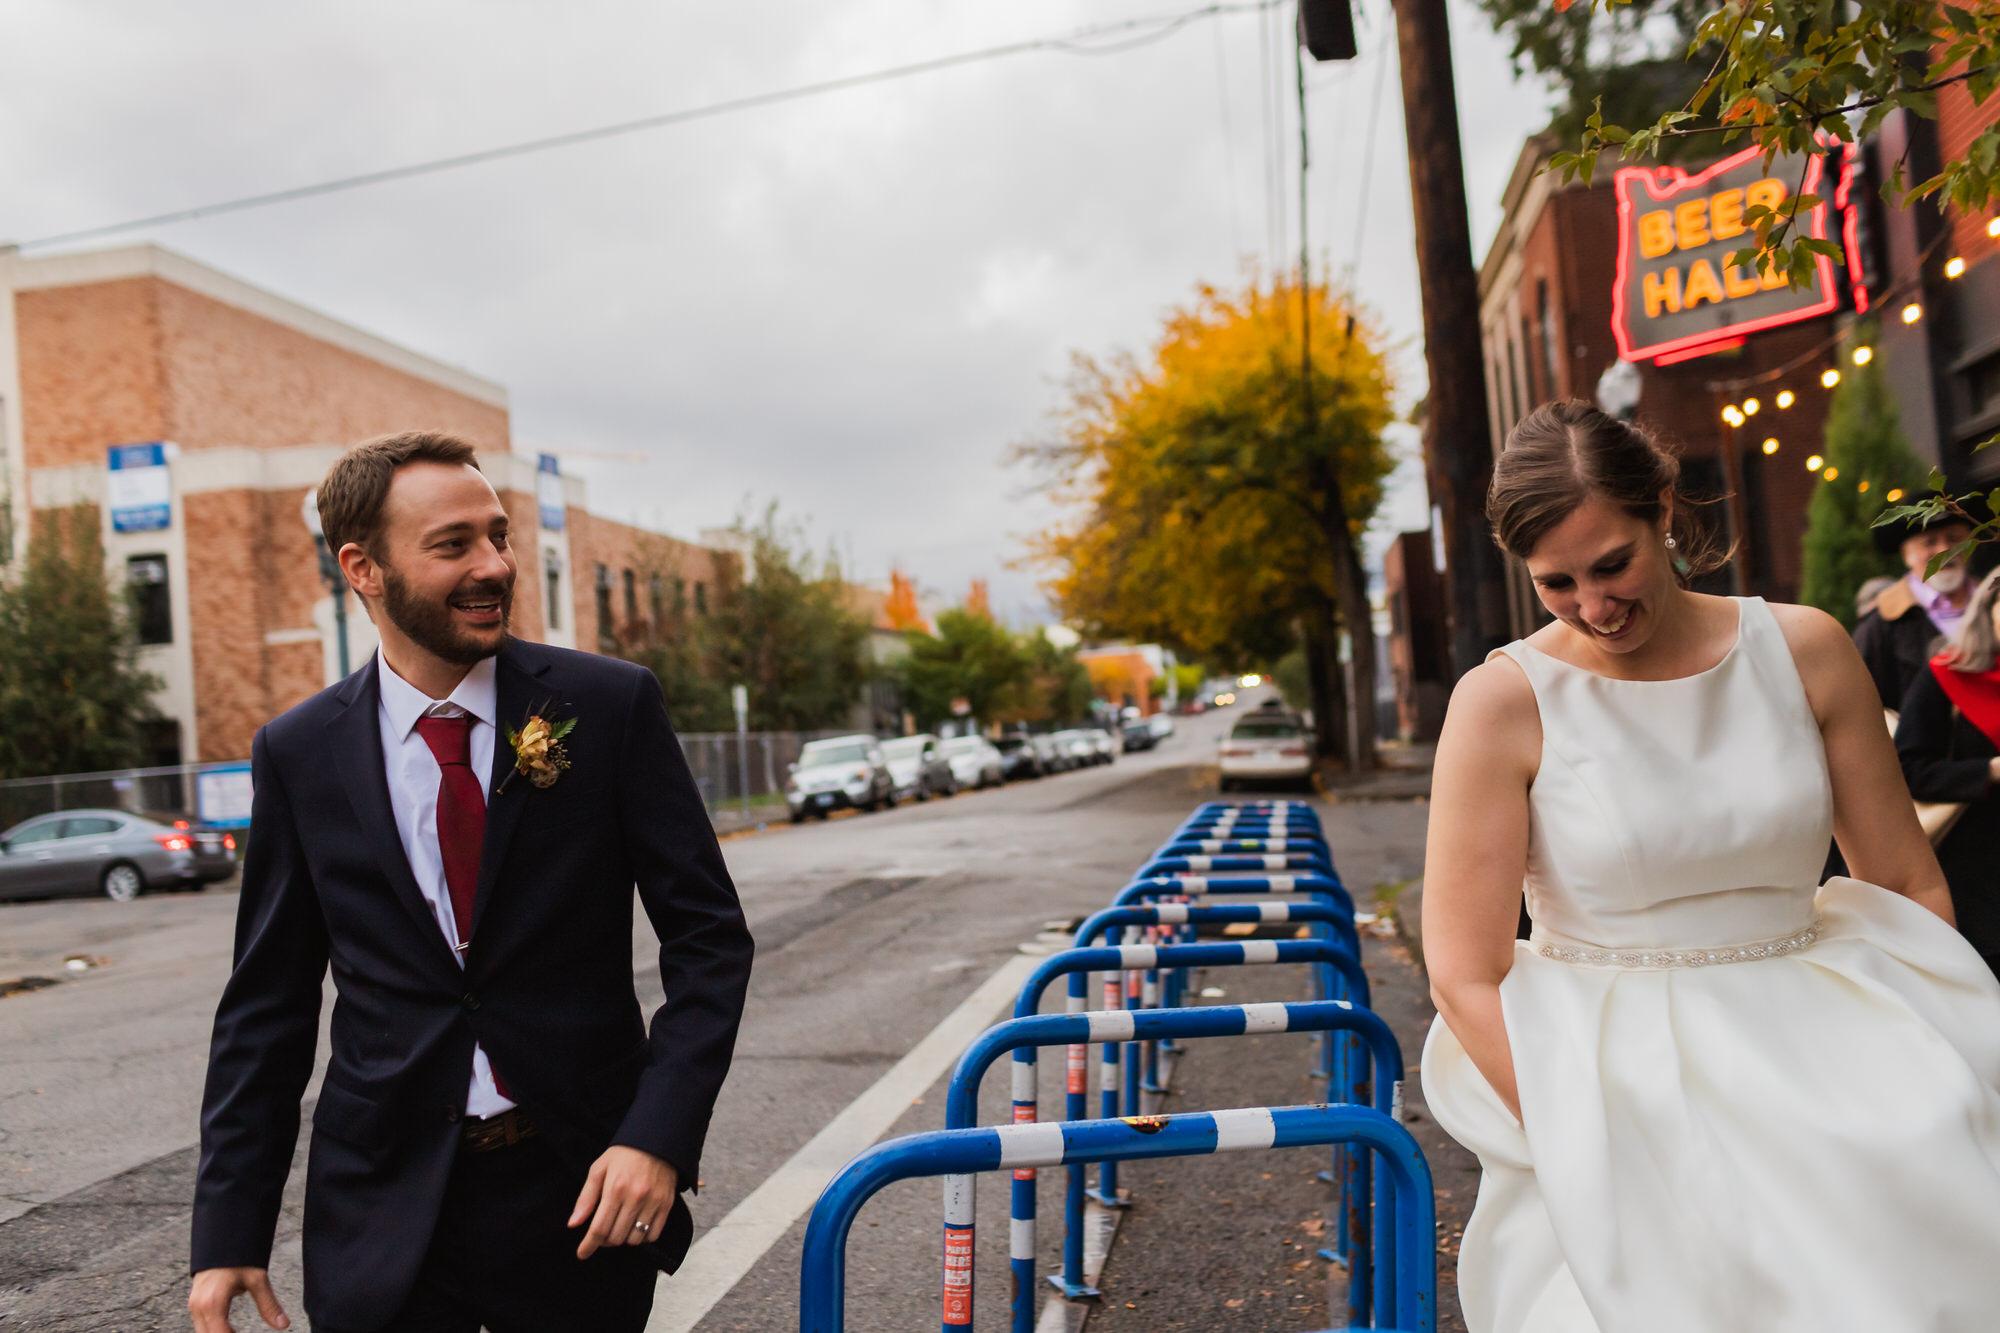 The_Evergreen_Portland_wedding_026